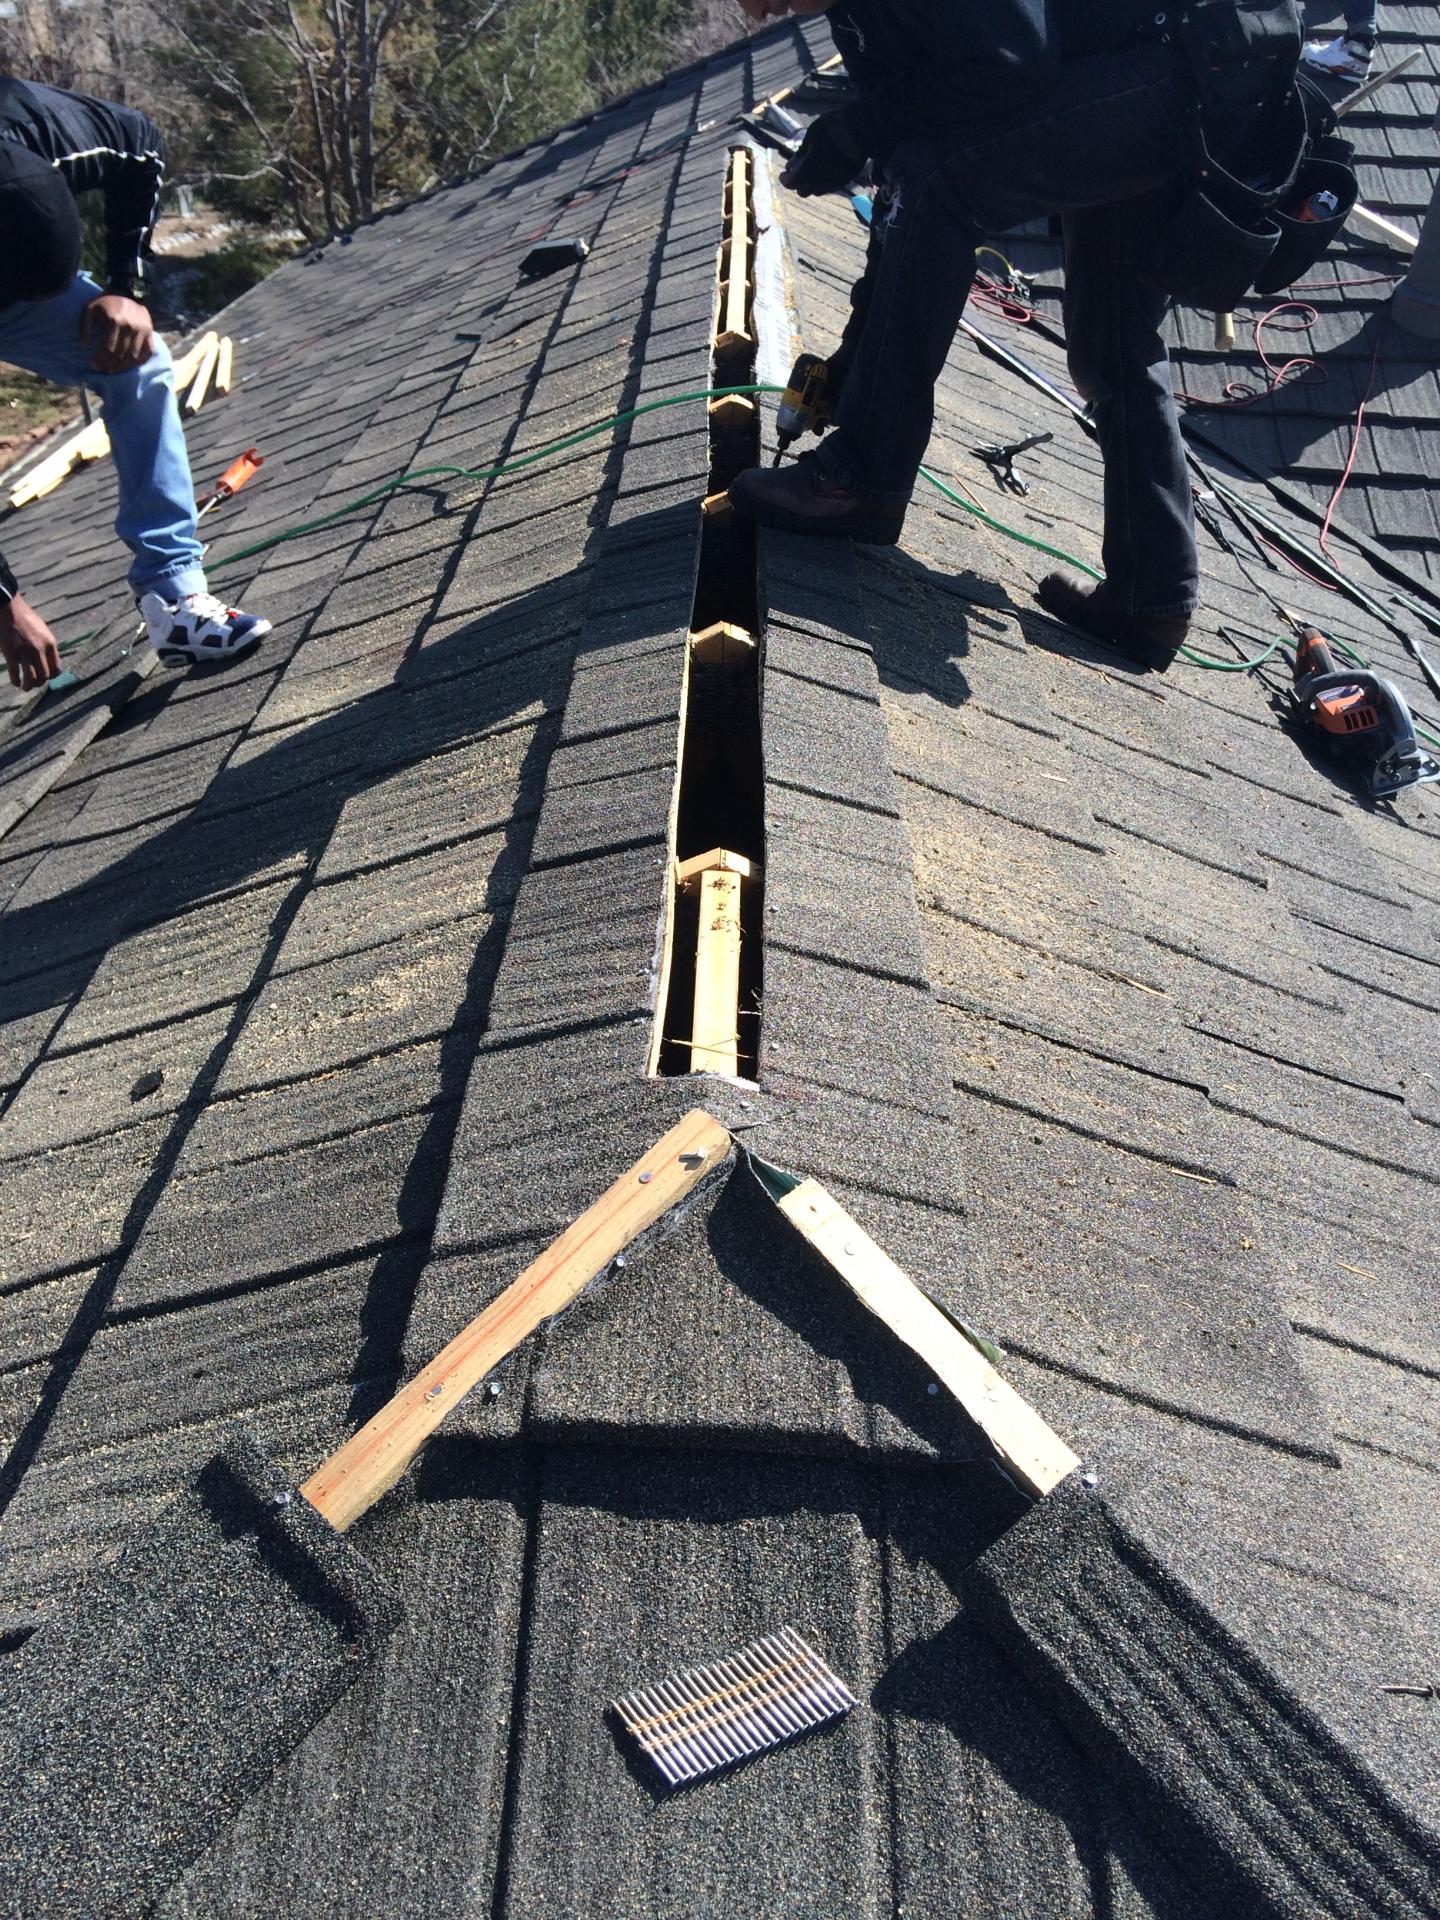 Cutting open a new Decra ridge vent system.